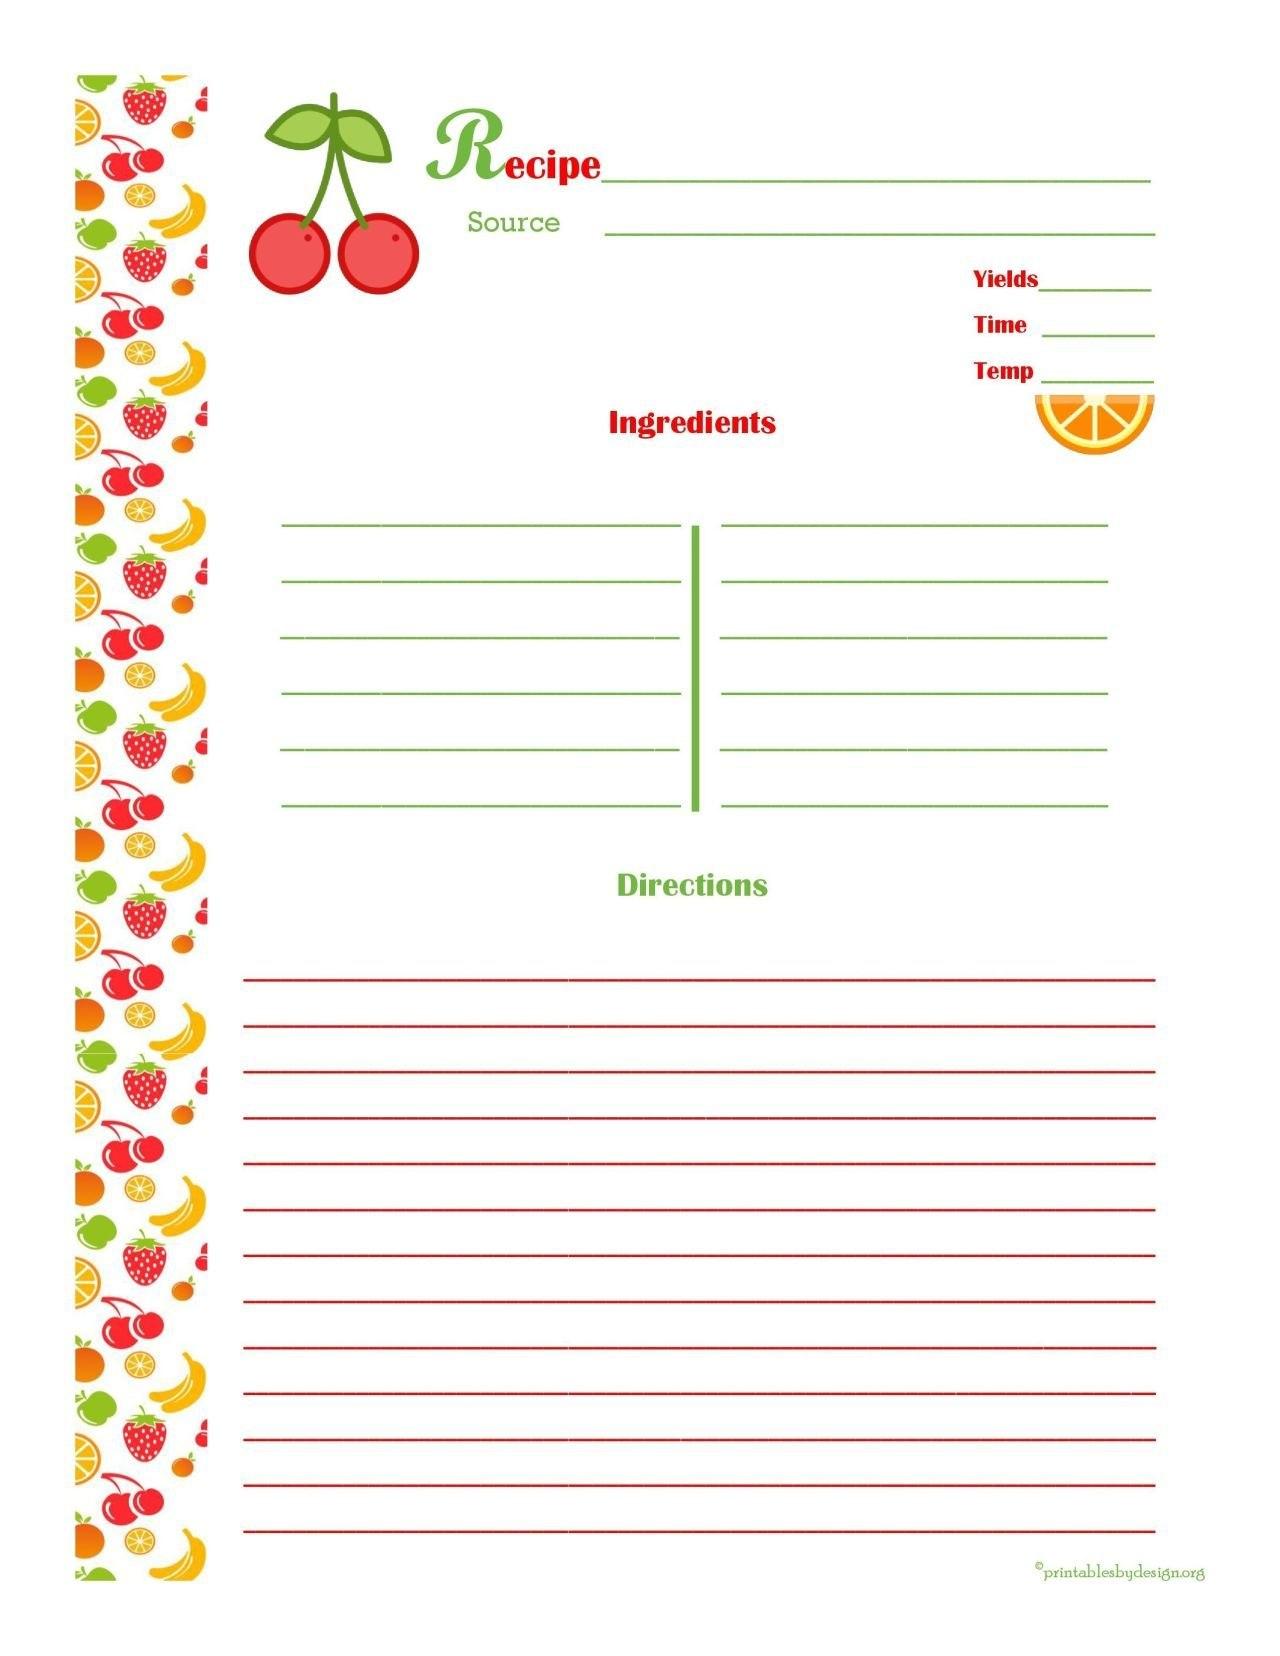 Free Editable Recipe Card Templates For Microsoft Word  Free With Regard To Free Recipe Card Templates For Microsoft Word